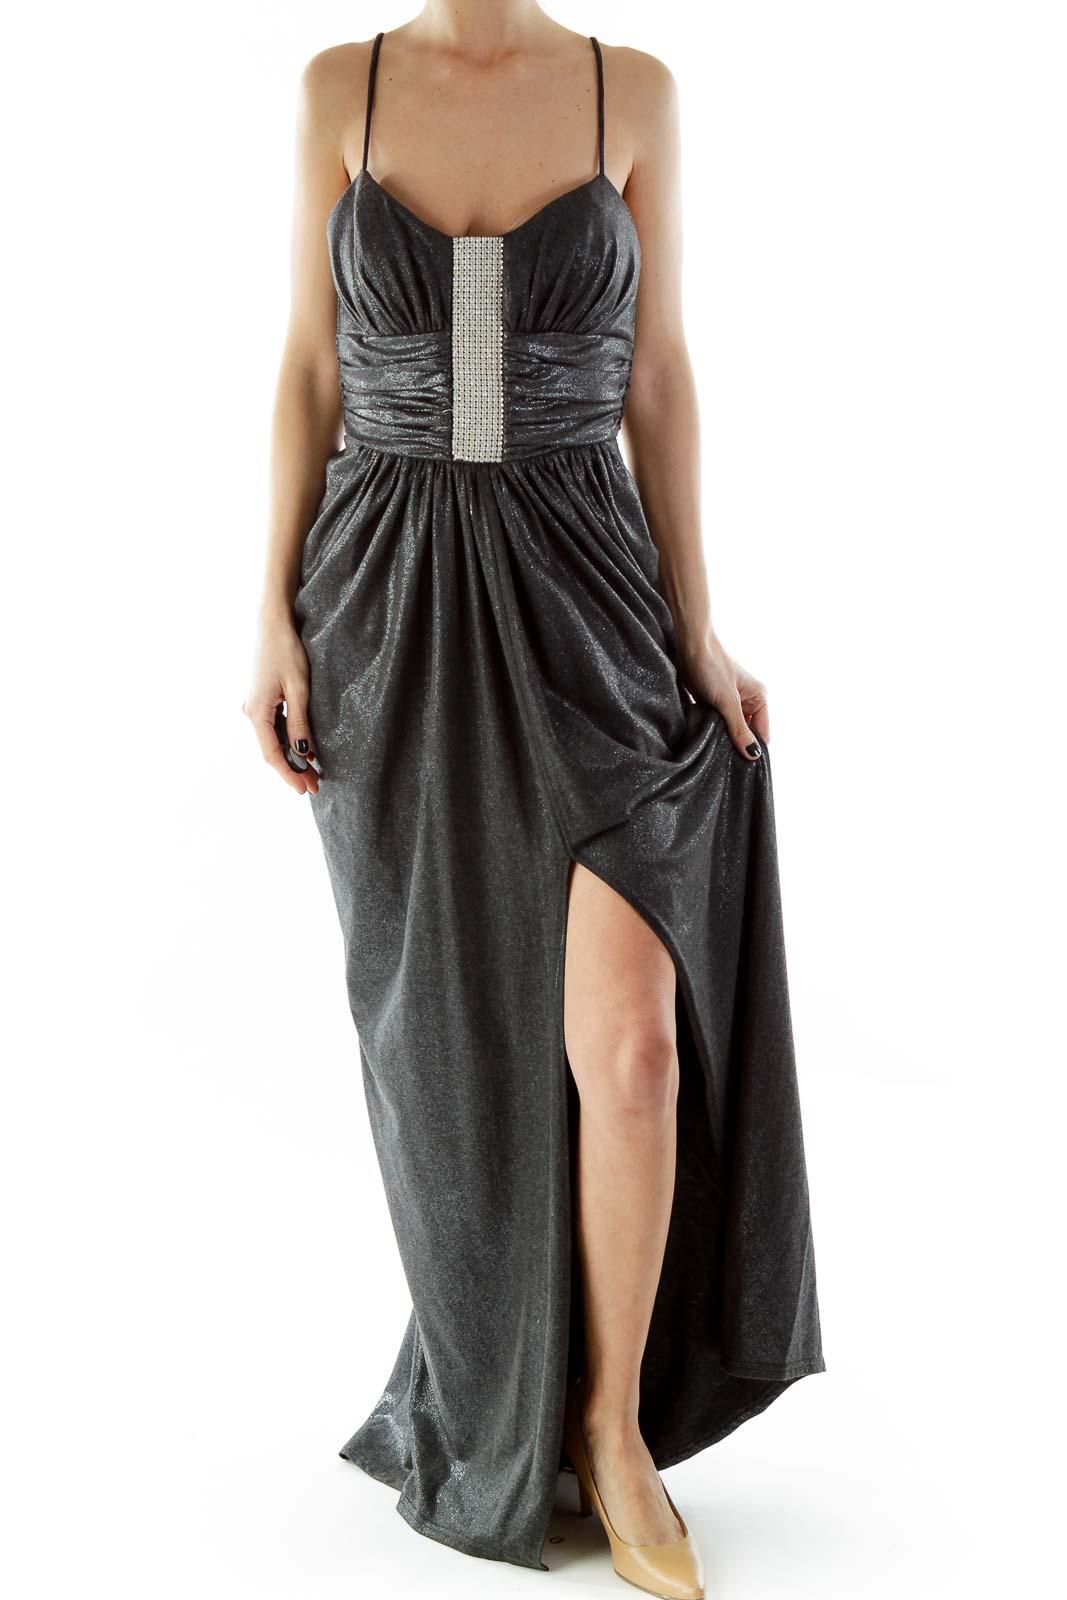 Gray Spaghetti Strap Metallic Evening Dress with Rhinestones